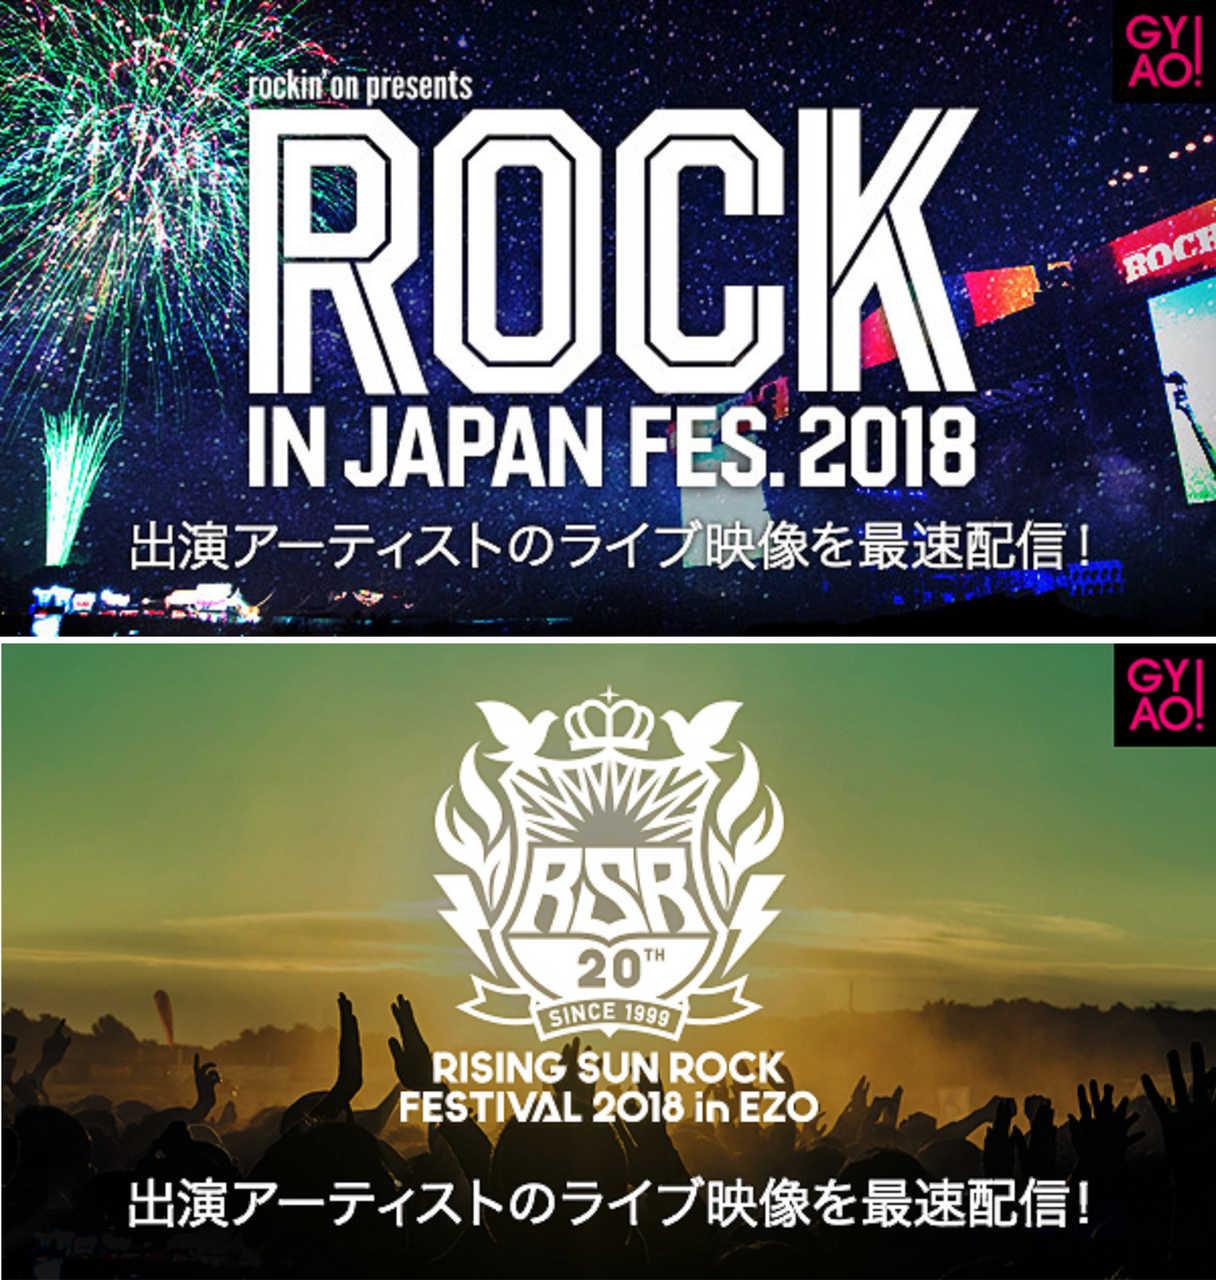 『ROCK IN JAPAN FESTIVAL 2018』&『RISING SUN ROCK FESTIVAL 2018 in EZO』